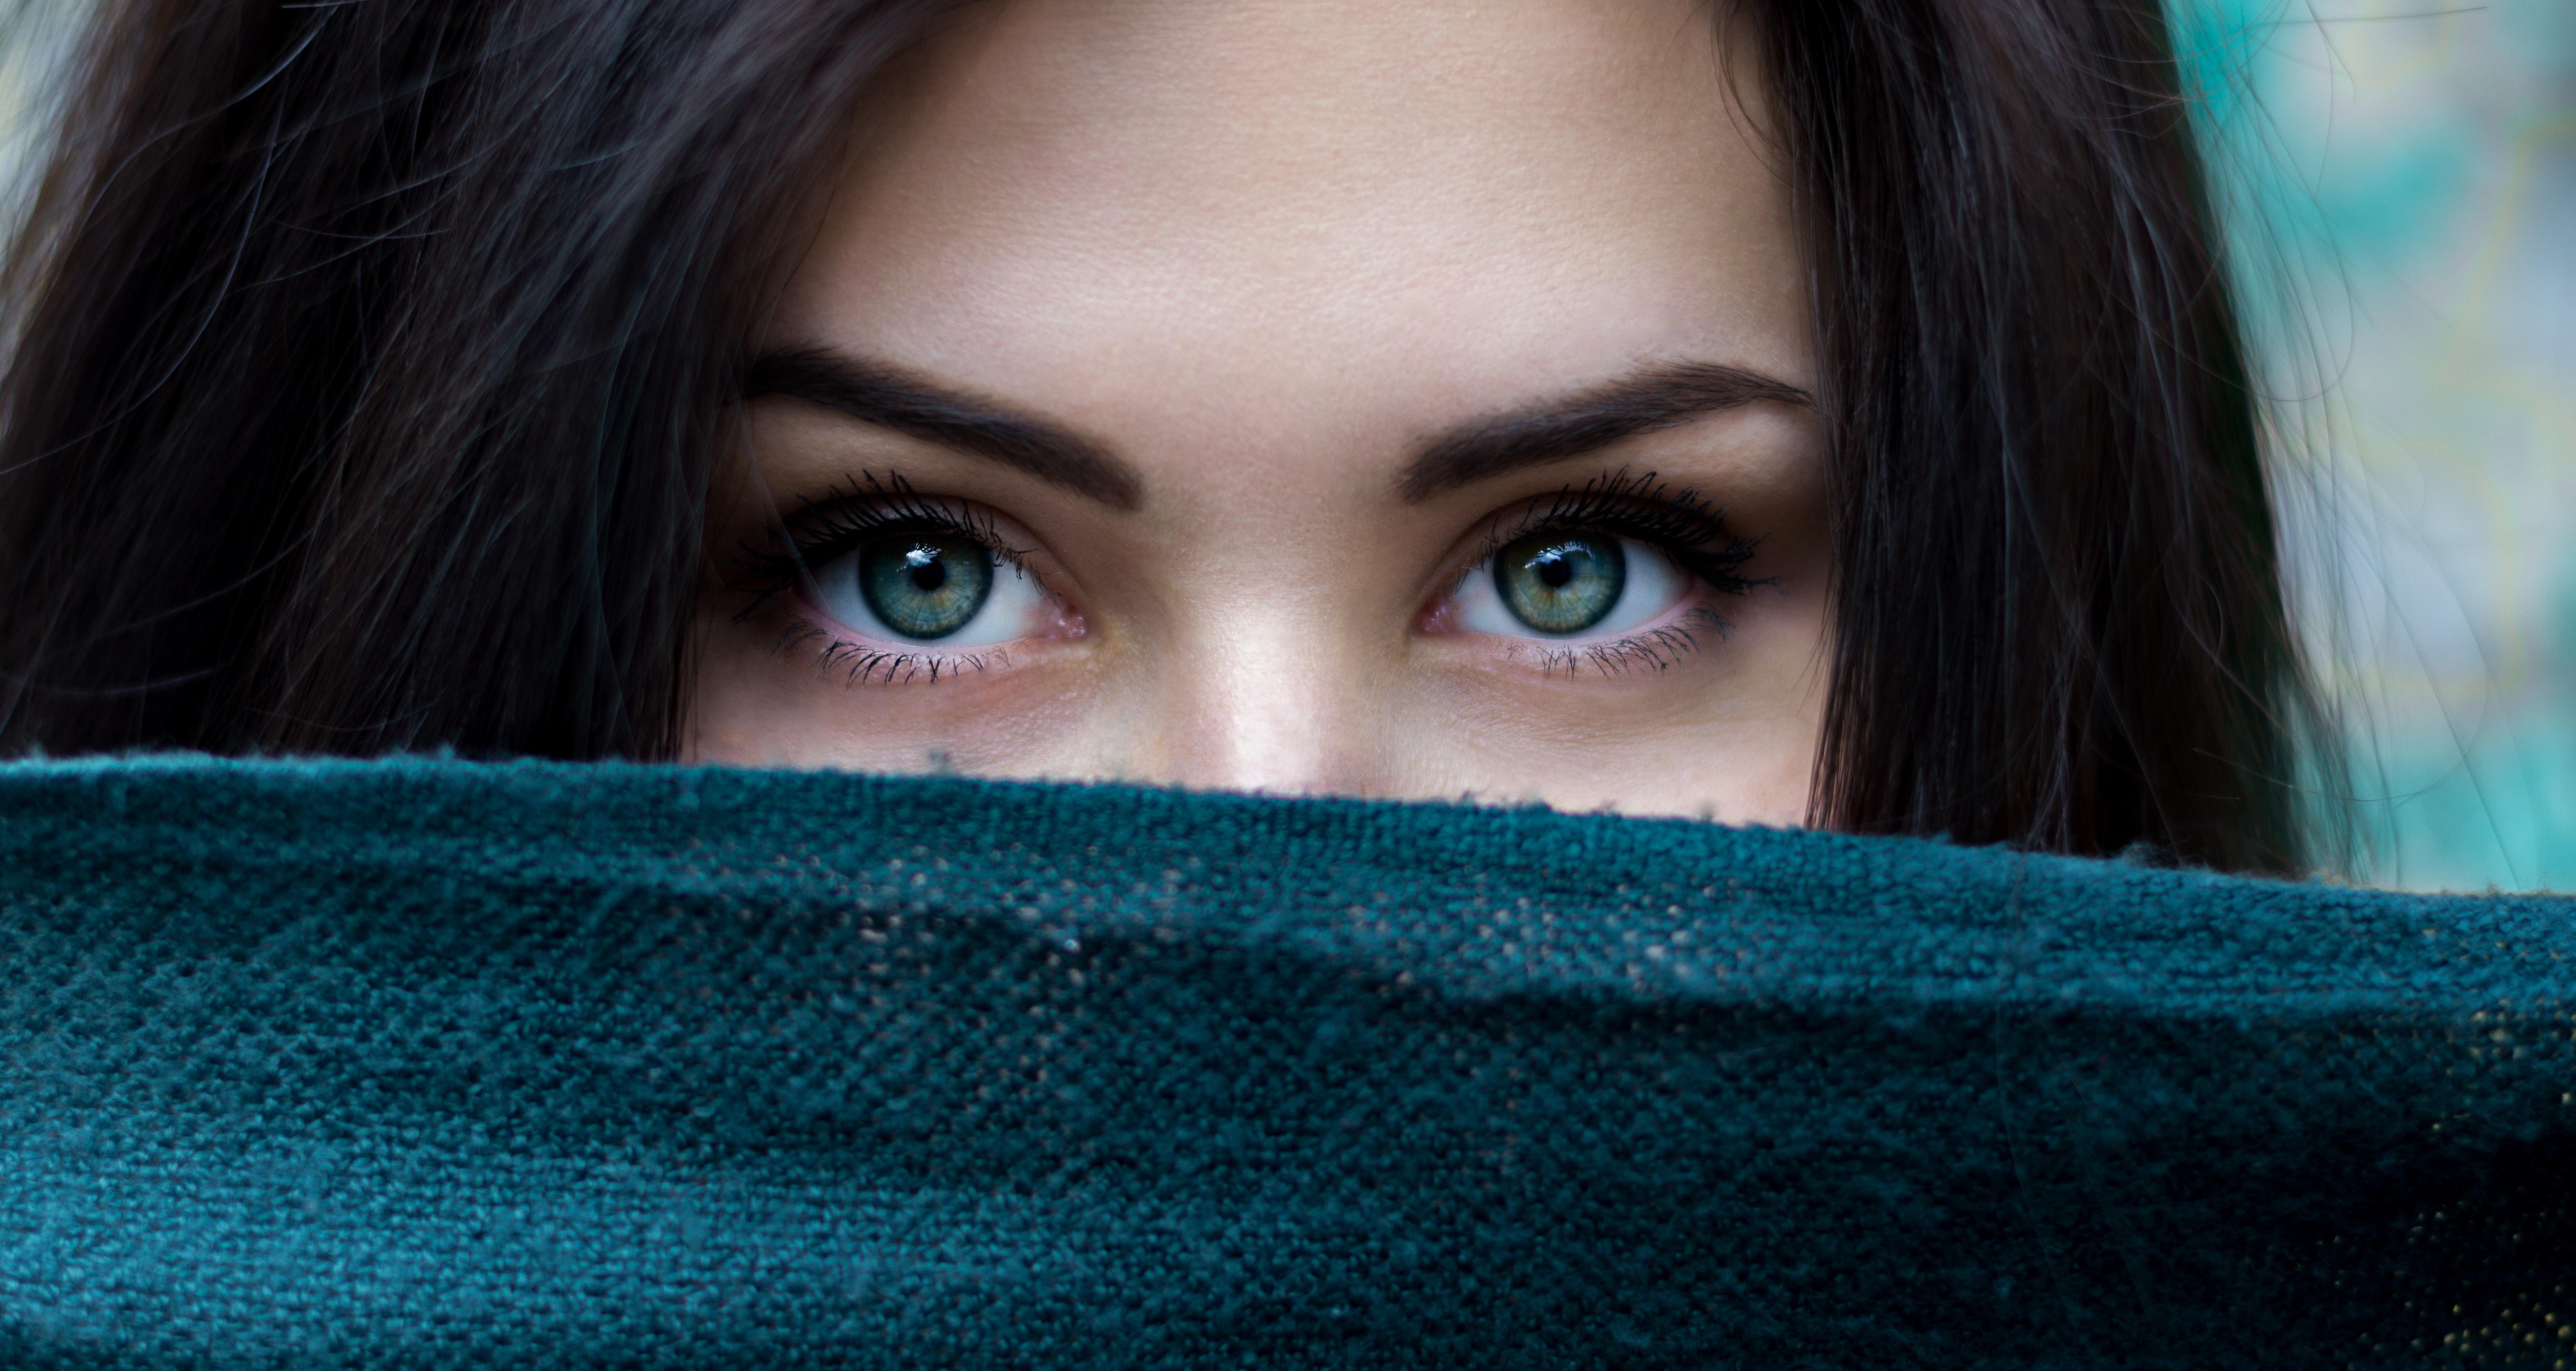 Eyelash Extension, Sejarahnya yang Tidak Banyak Diketahui